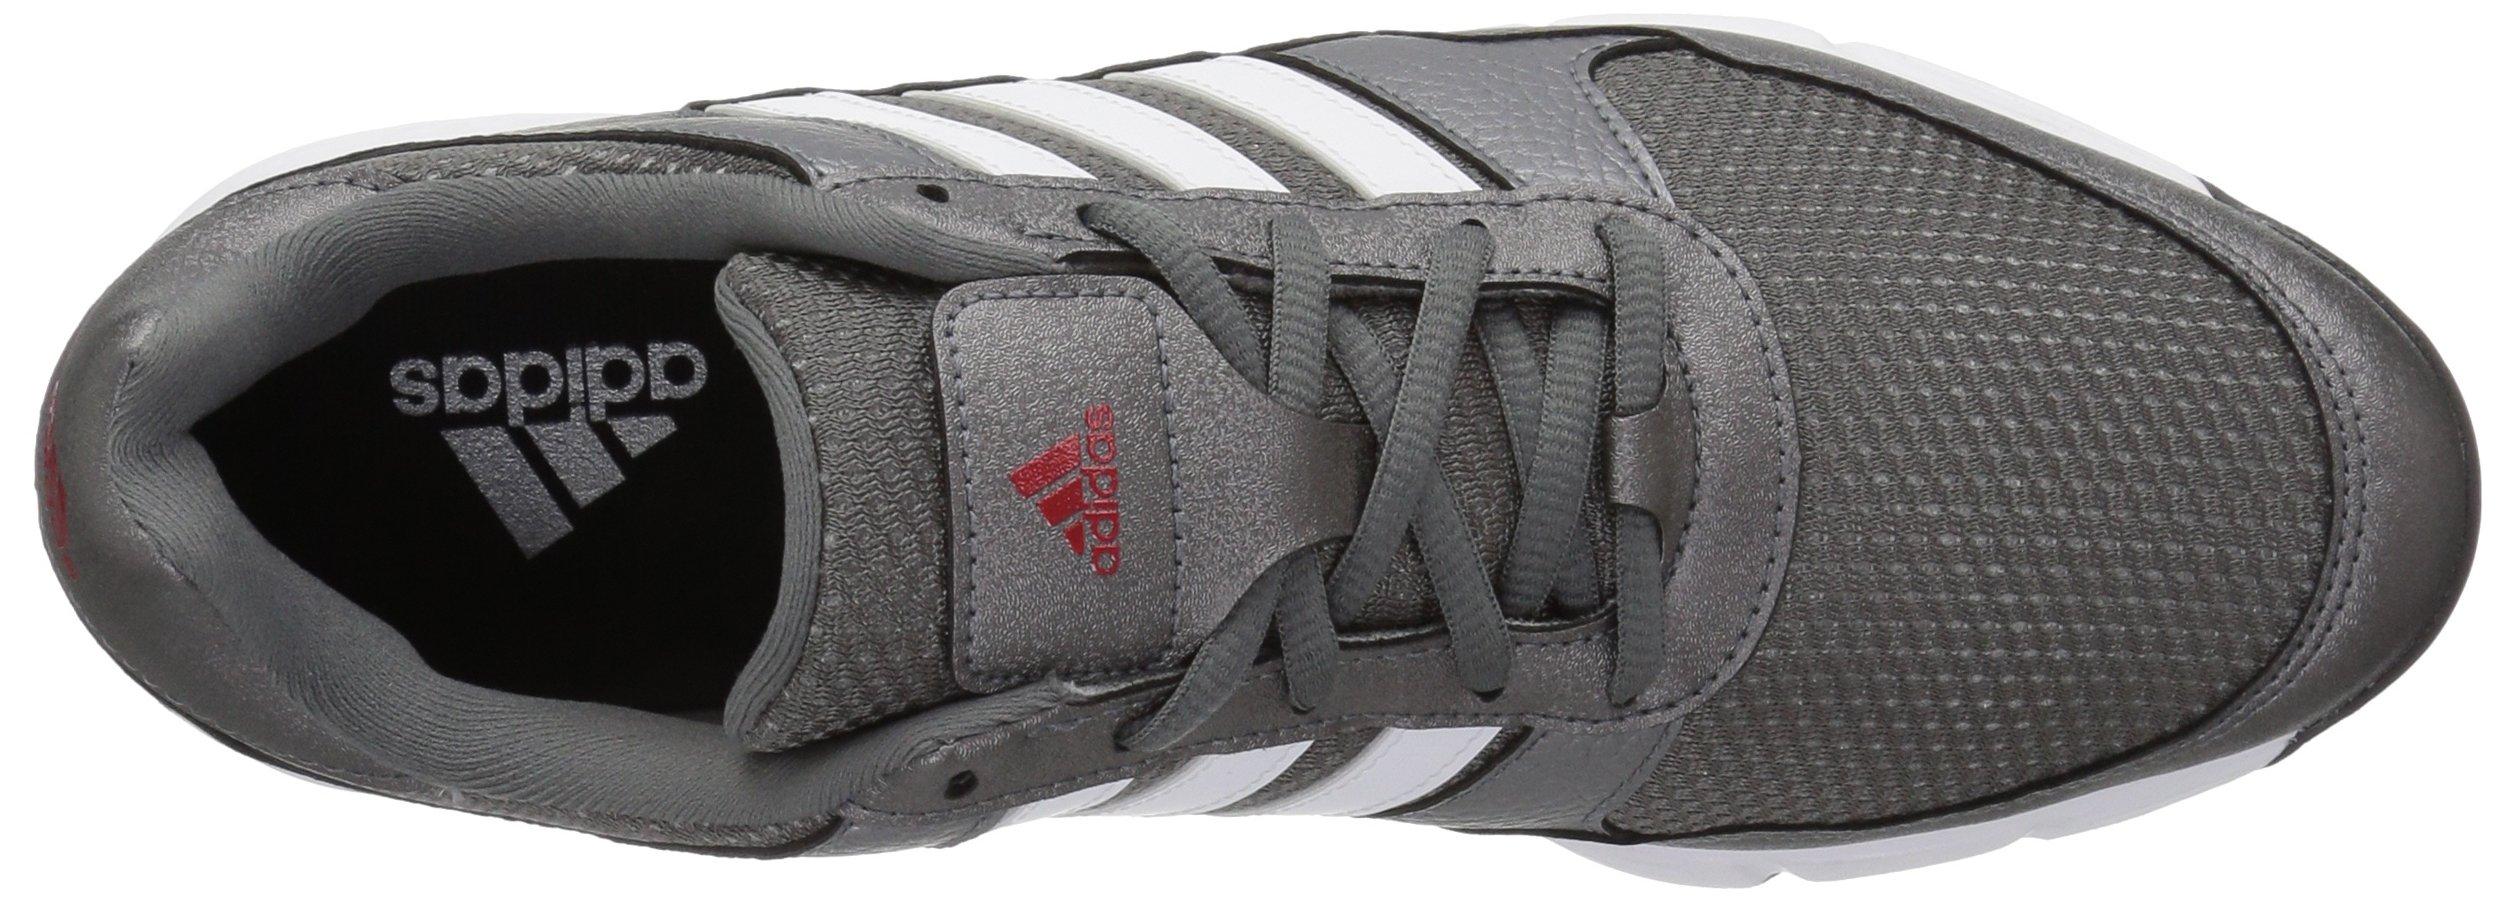 adidas Men's Tech Response Golf Shoe, Iron Metallic/White, 8.5 W US by adidas (Image #8)